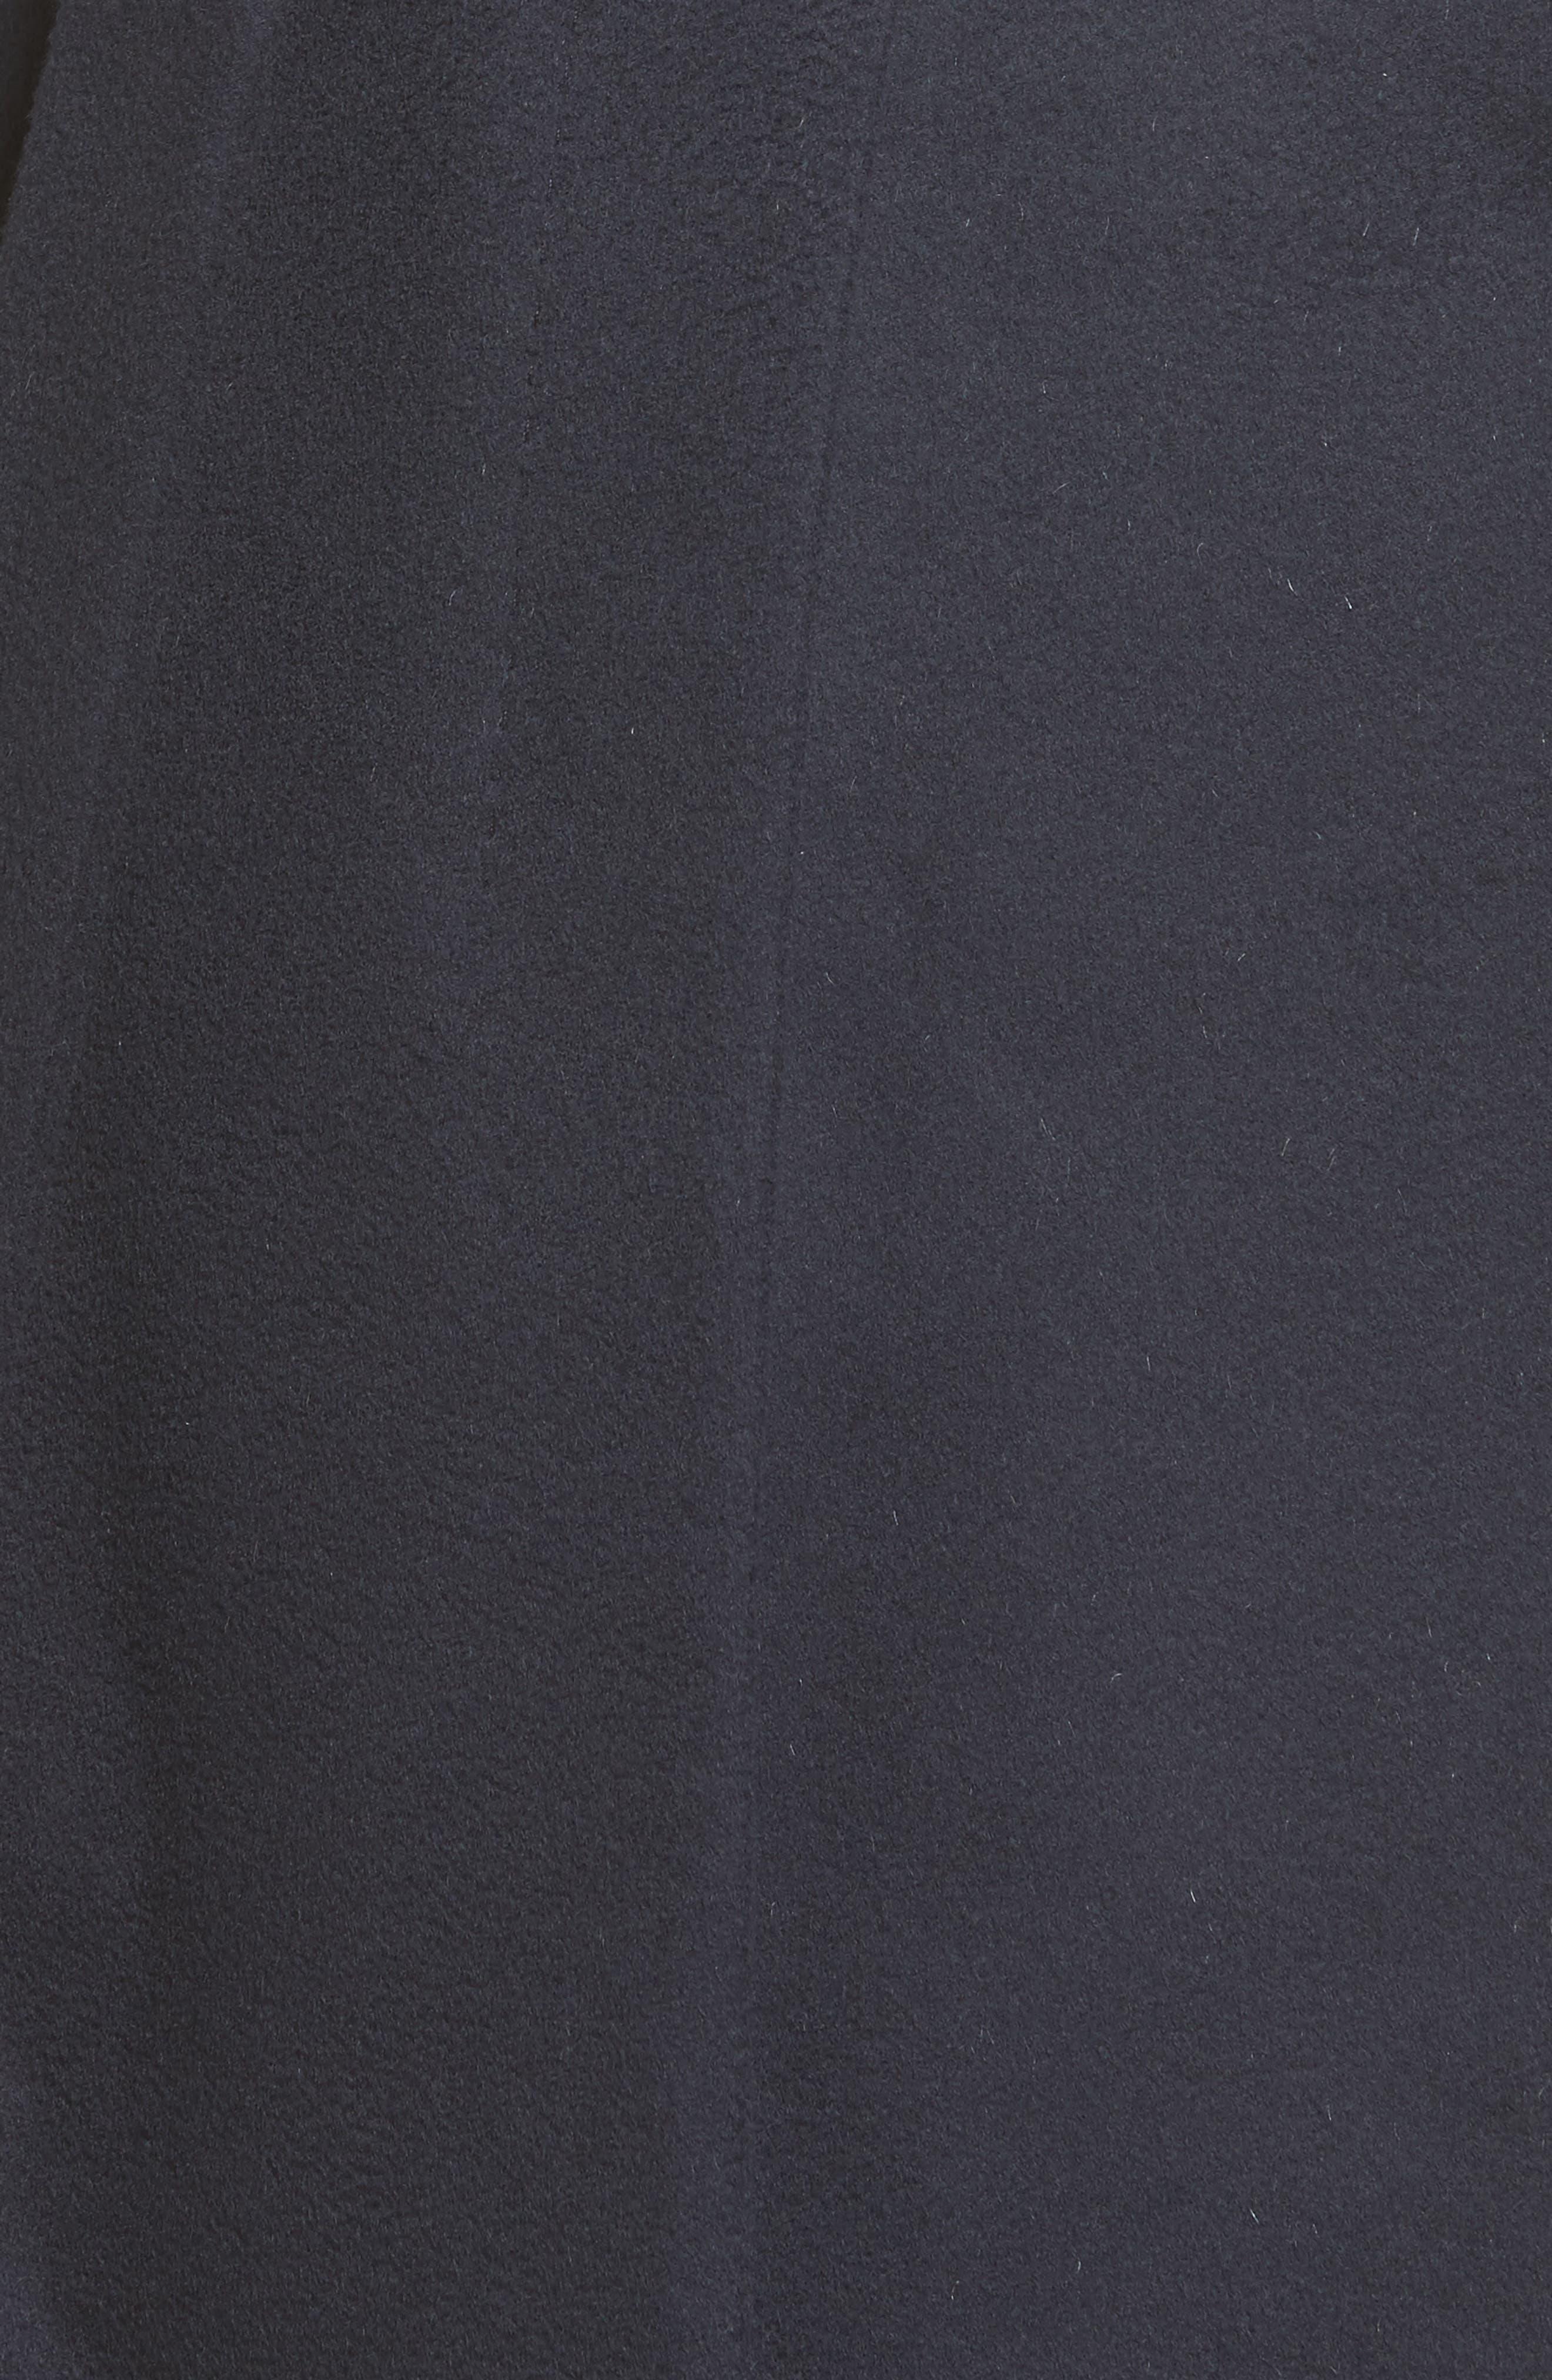 Cargona Wool Coat,                             Alternate thumbnail 6, color,                             480